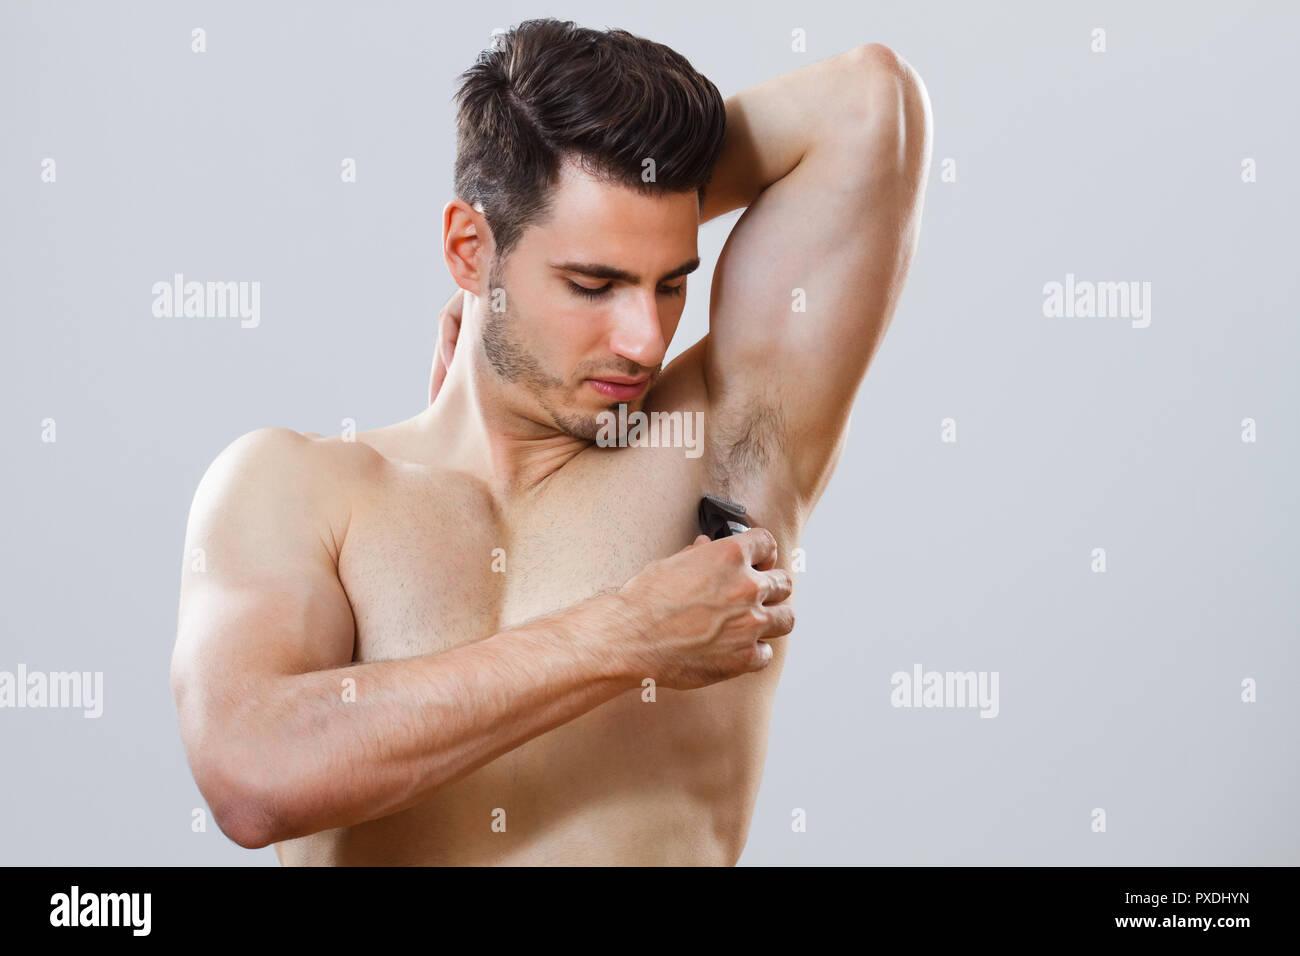 Man shaving his armpit - Stock Image